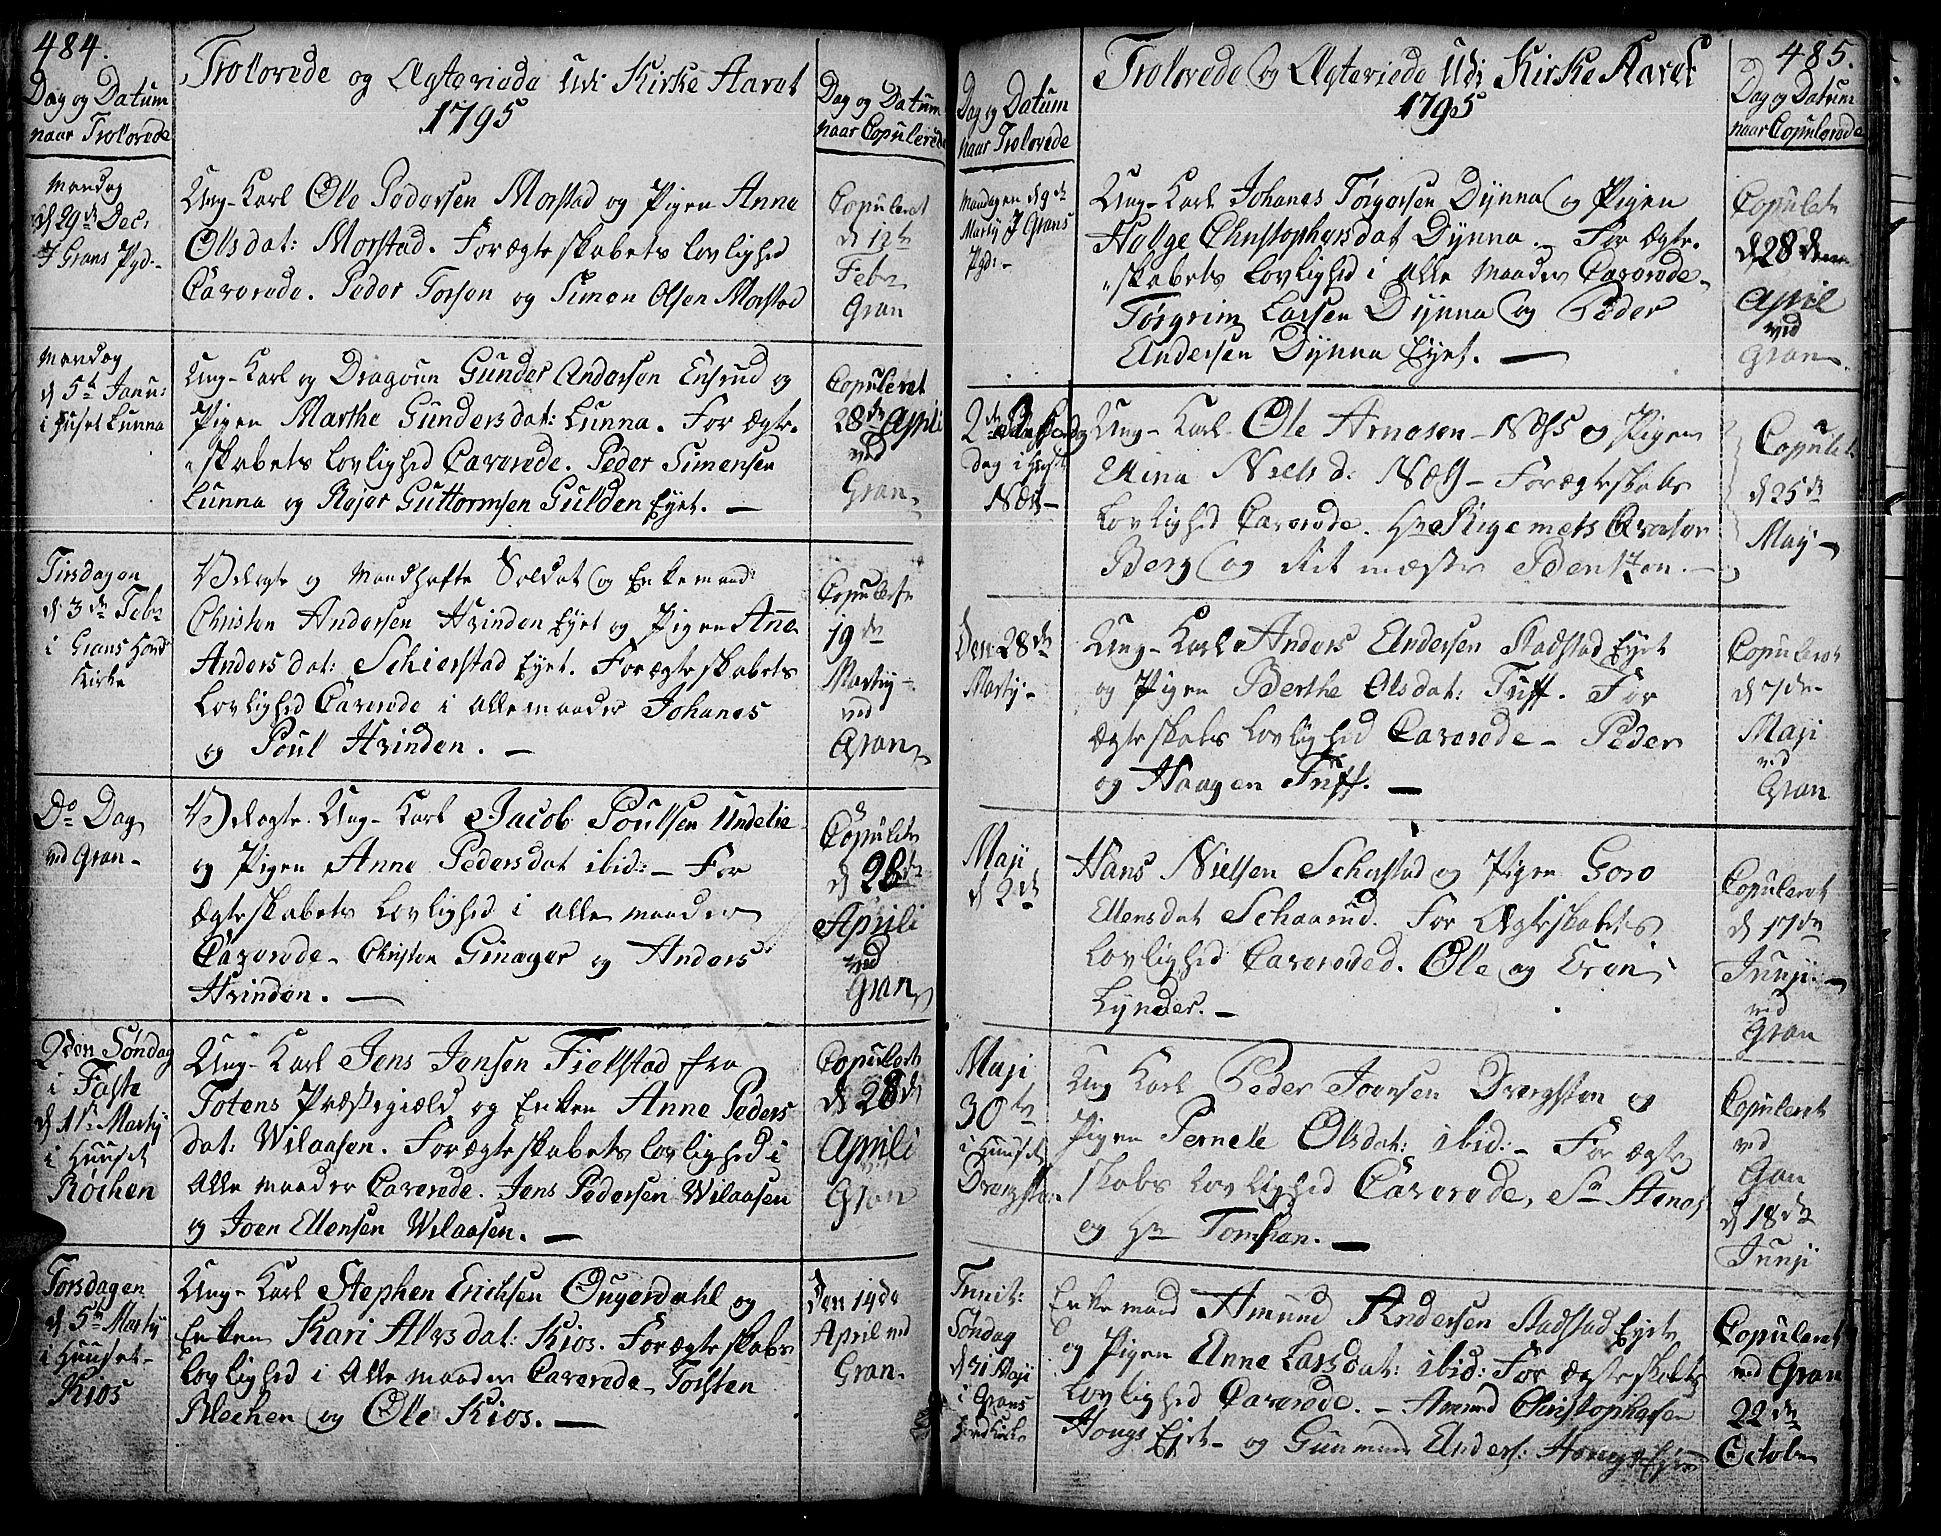 SAH, Gran prestekontor, Ministerialbok nr. 6, 1787-1824, s. 484-485